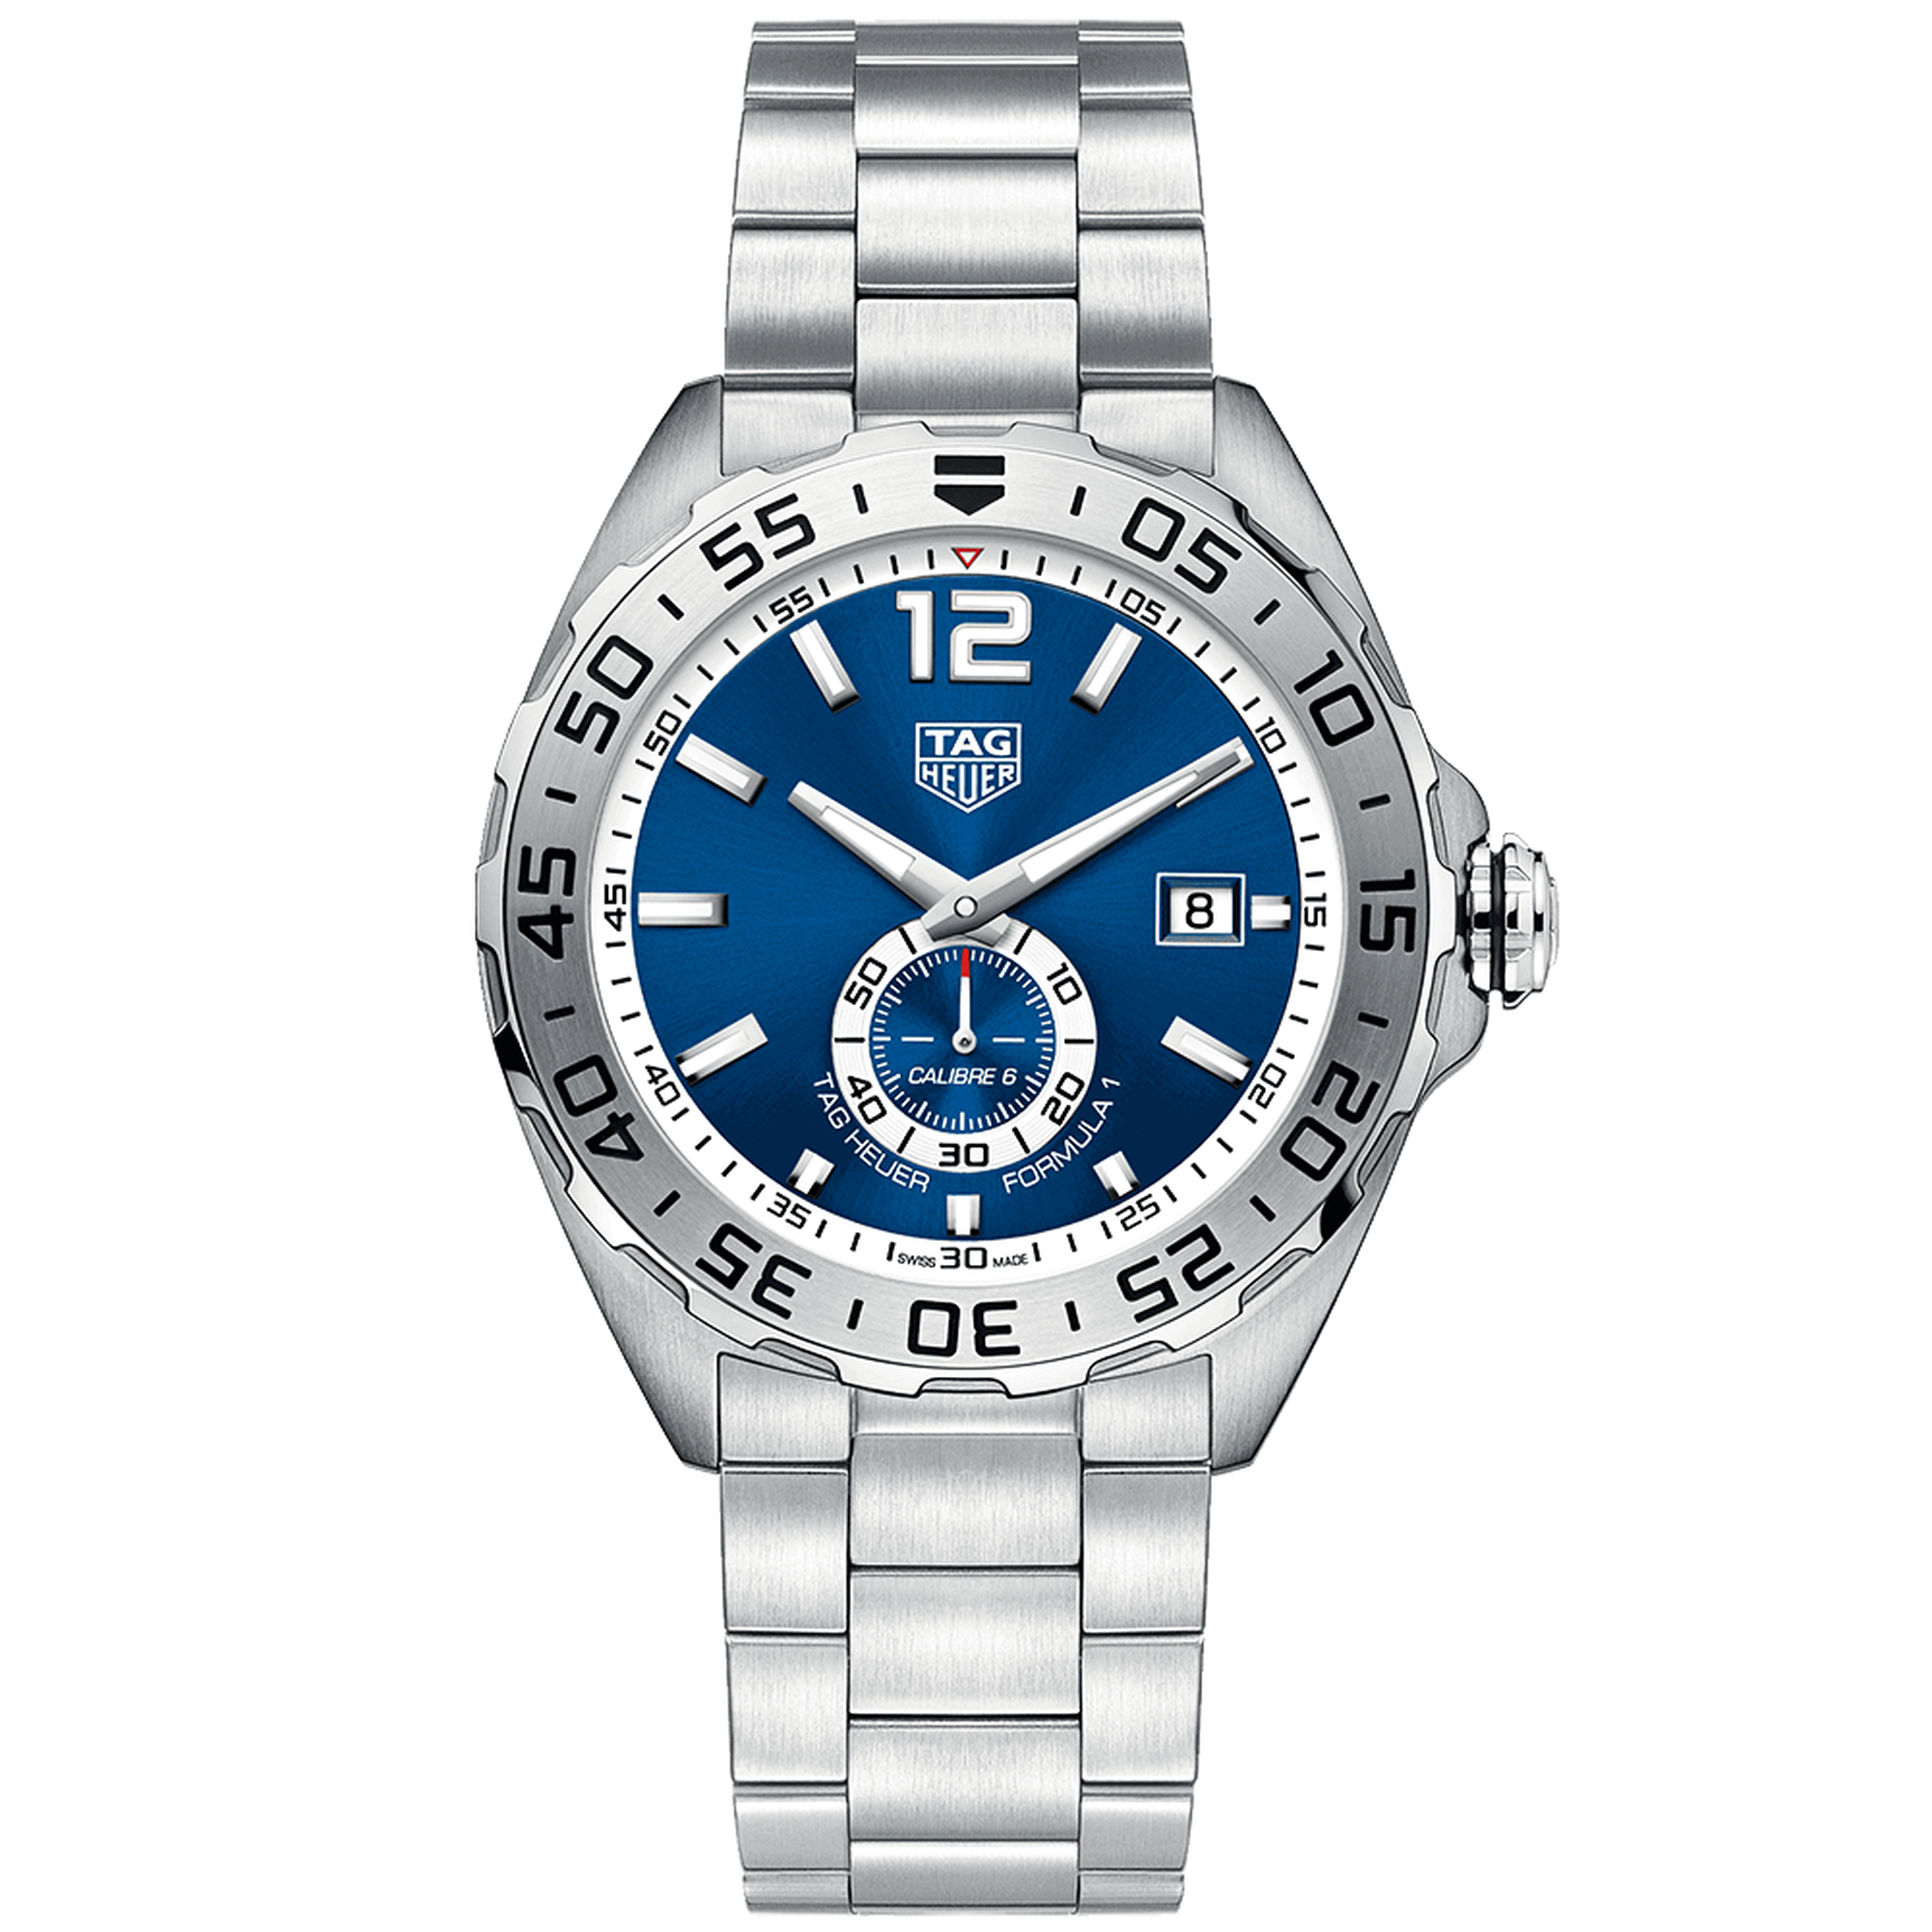 0171331b24f TAG Heuer TAG Heuer Formula 1 43mm Blue White Dial Men s Automatic Bracelet  Watch